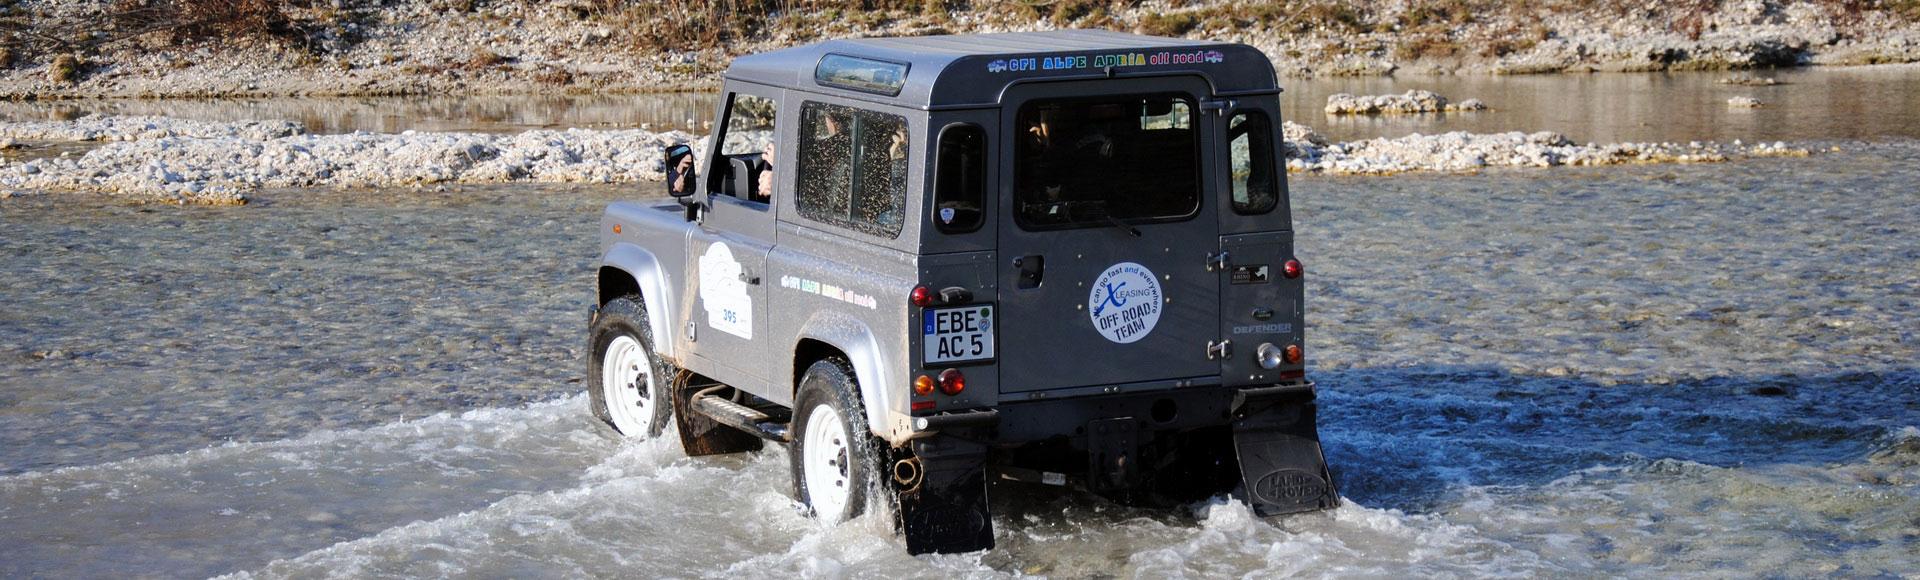 Land Rover Defender Gradisca 4x4 2016 Herbst_3652